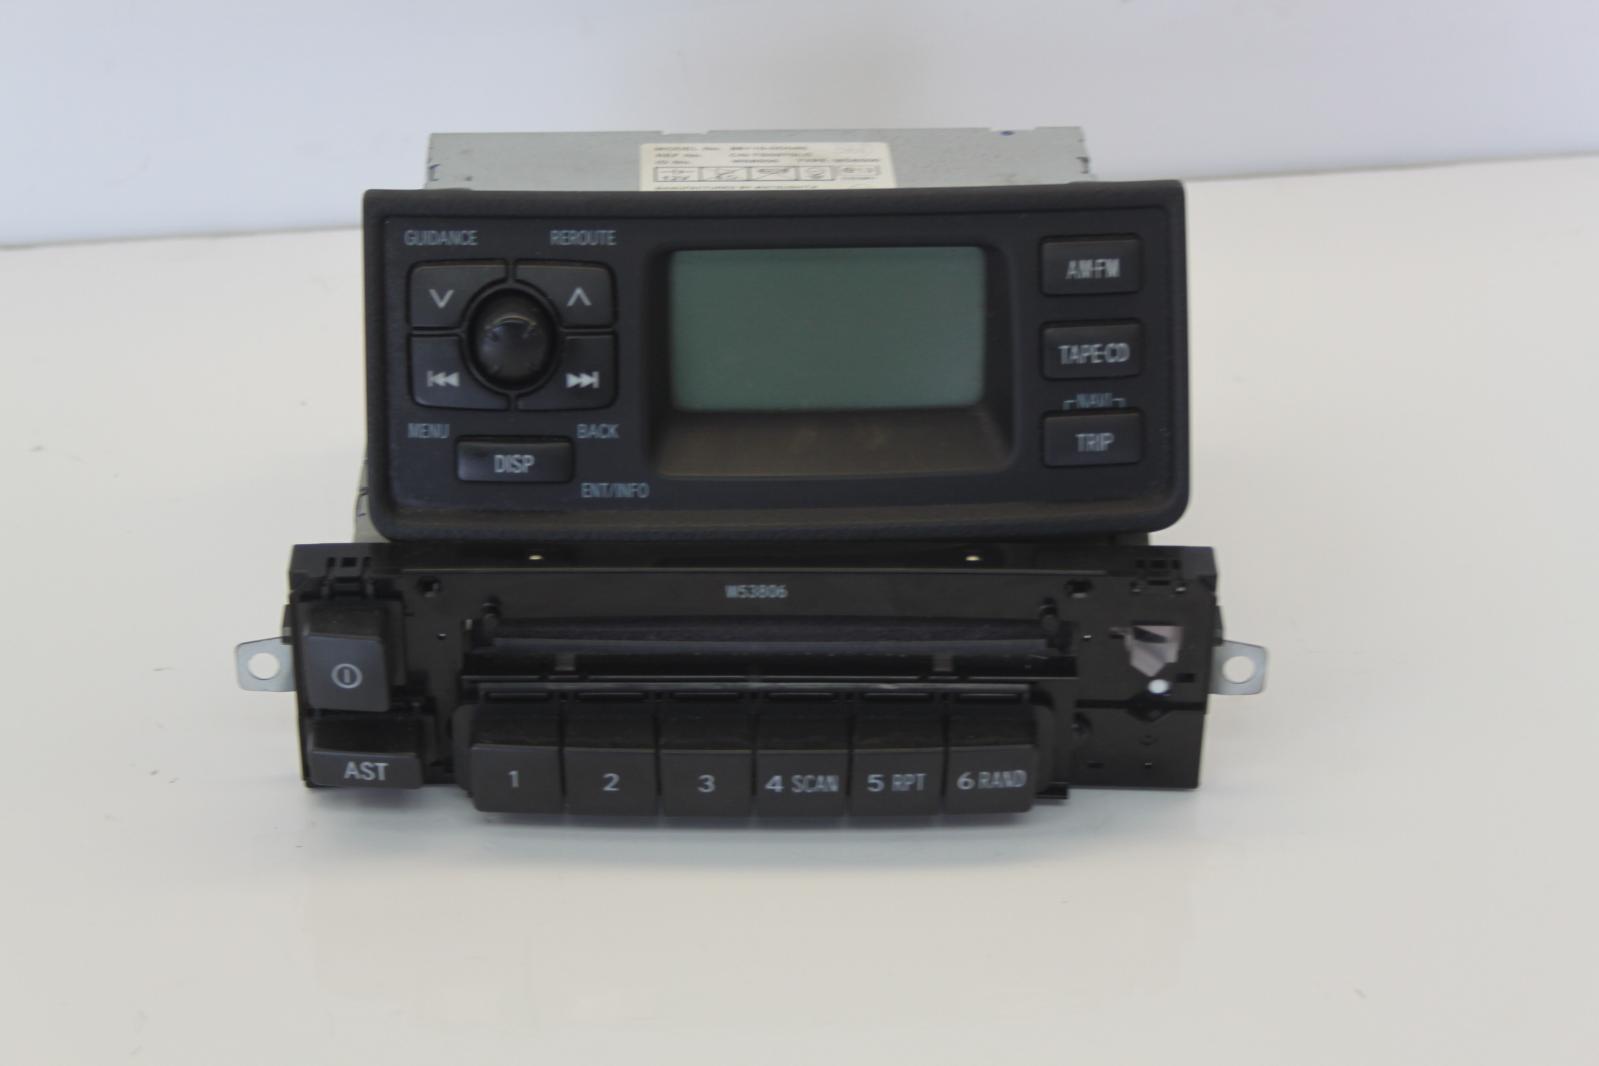 Toyota Yaris Stereo Wiring Diagram